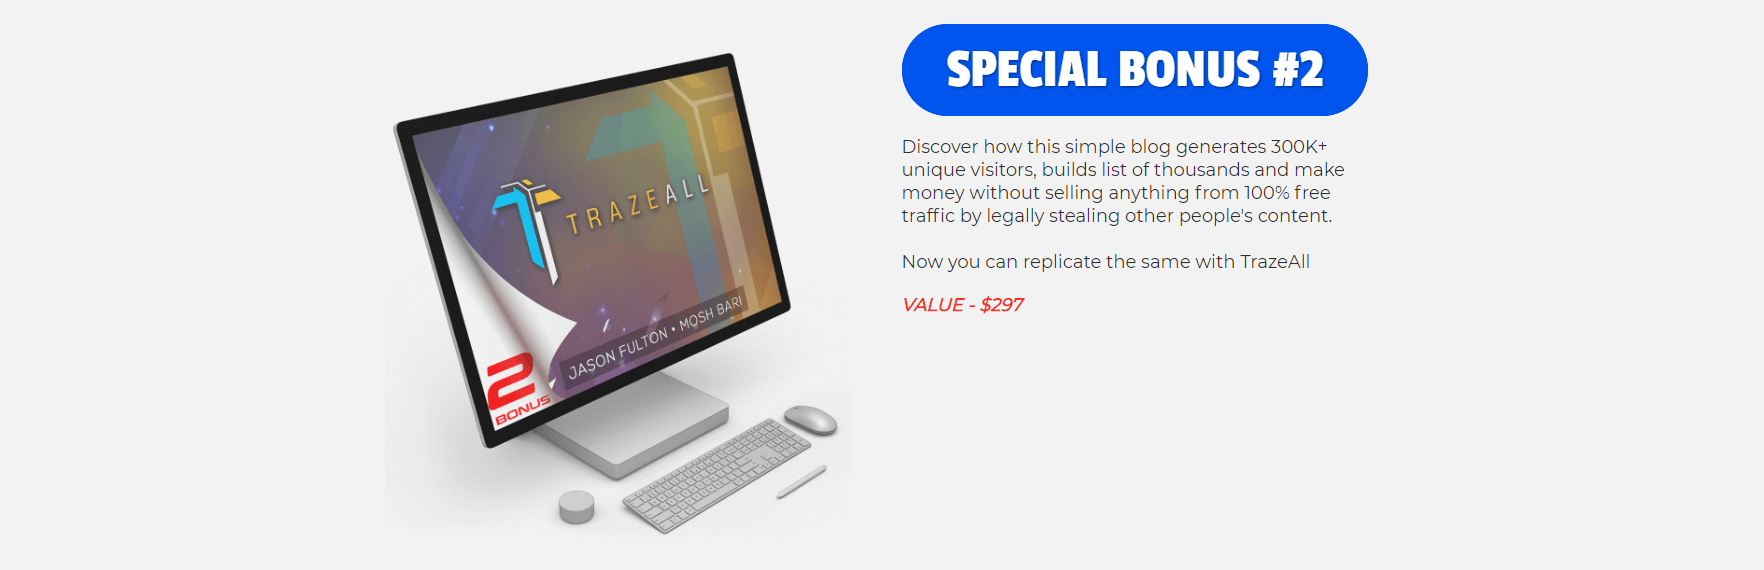 Trazeall-Review-Bonus-2